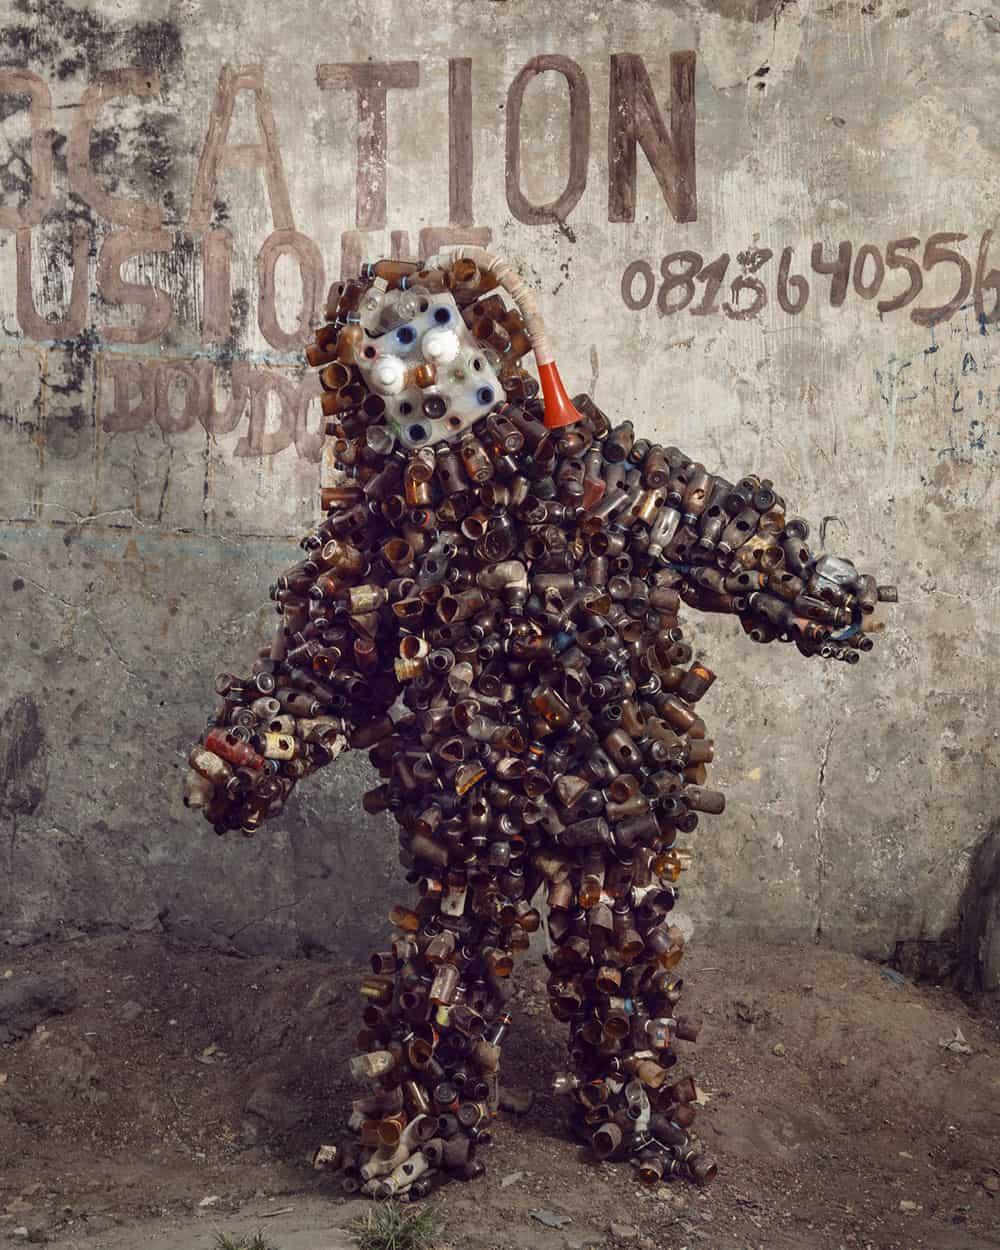 Untitled #24, 2020 Homo Detritus, Real Portraitik #5 Kinshasa, RDC ©Stephan Gladieu